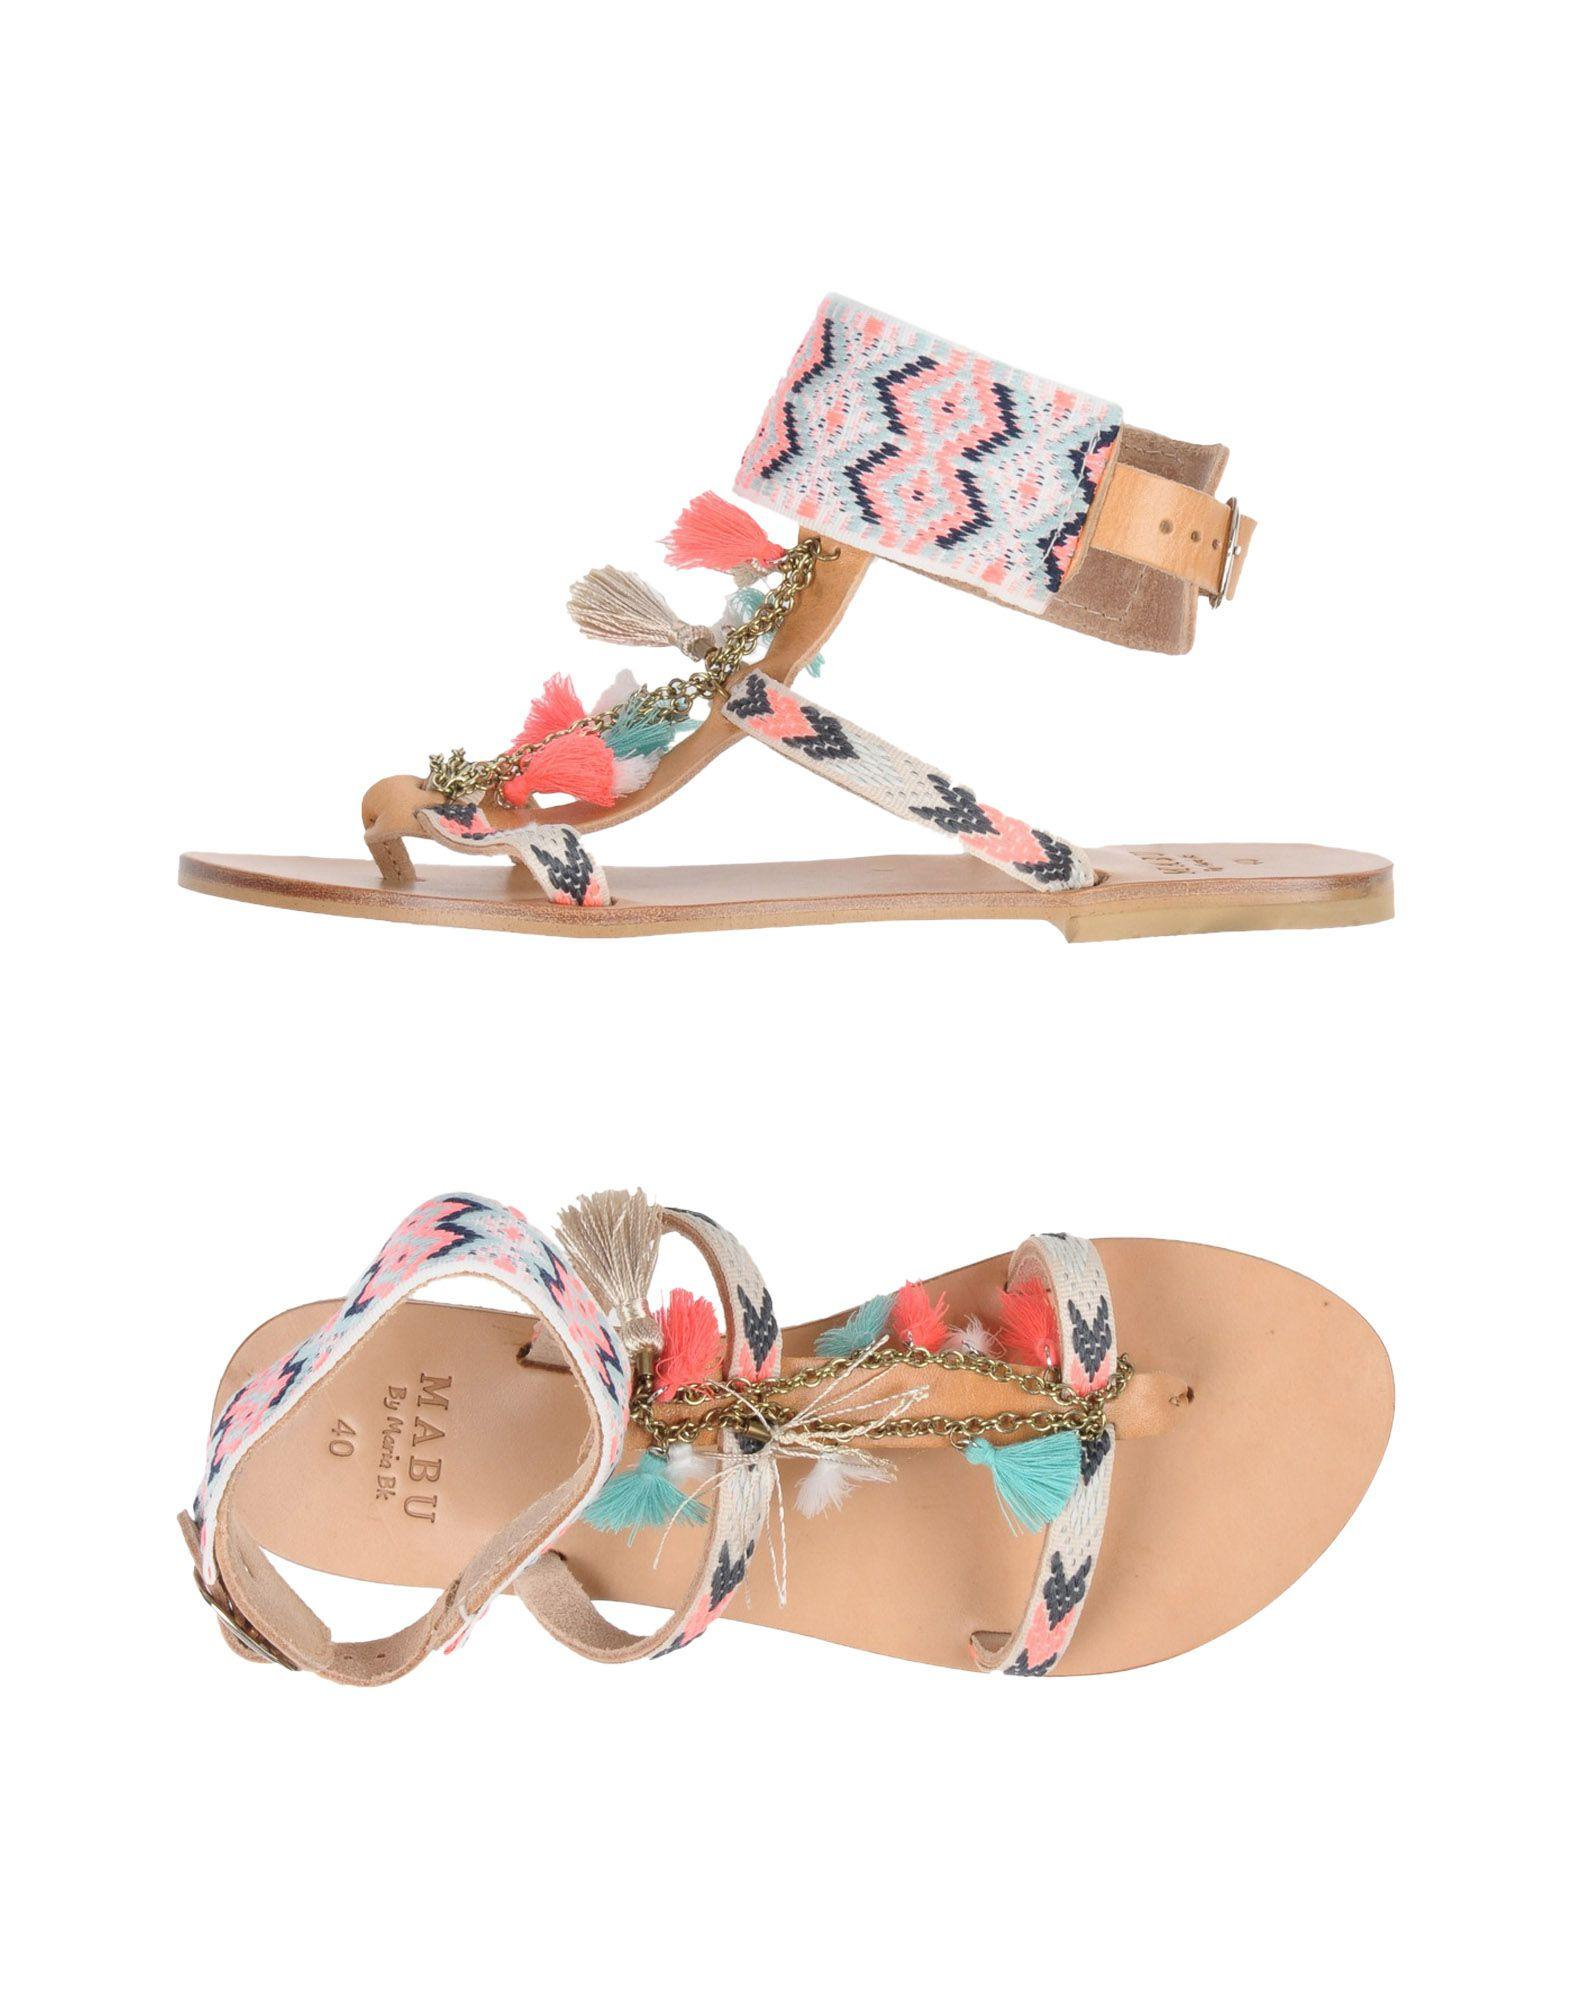 Mabu By Maria Bk Flip Flops In Pink